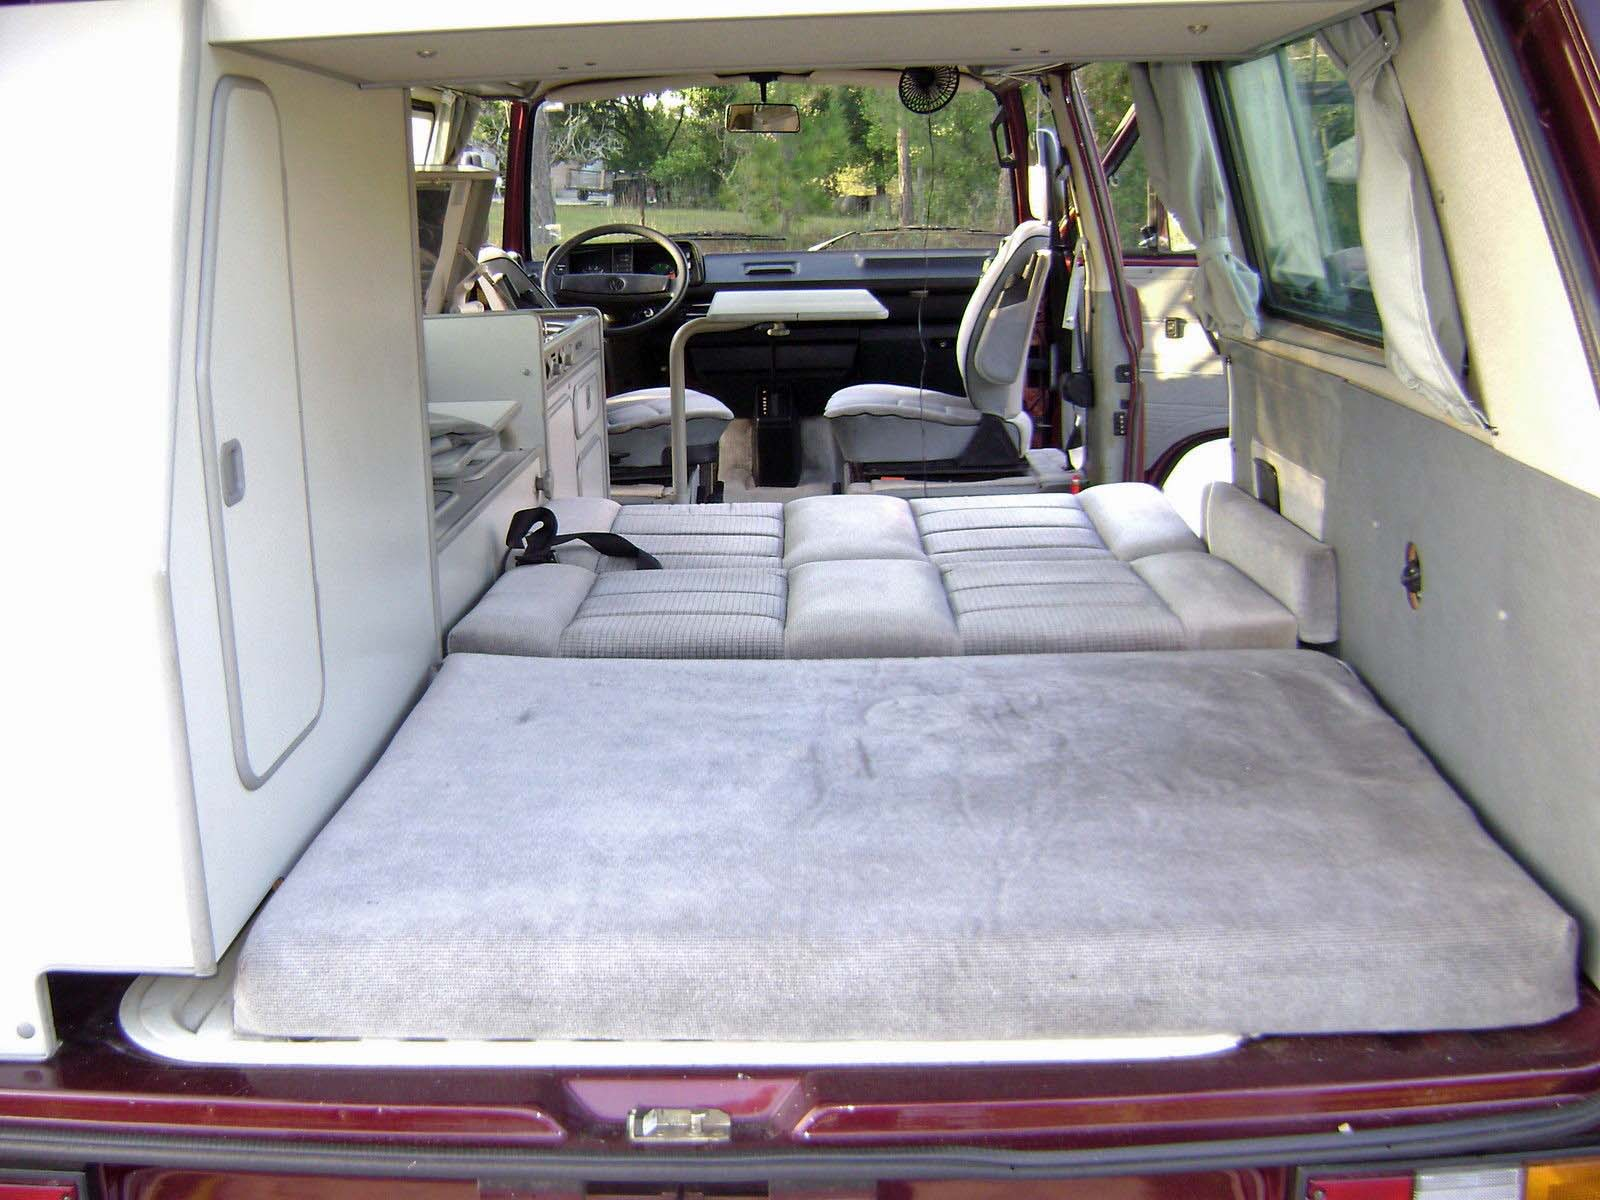 VW Vanagon Westfalia Camper – 117k – Auto – $19,500 in Florida